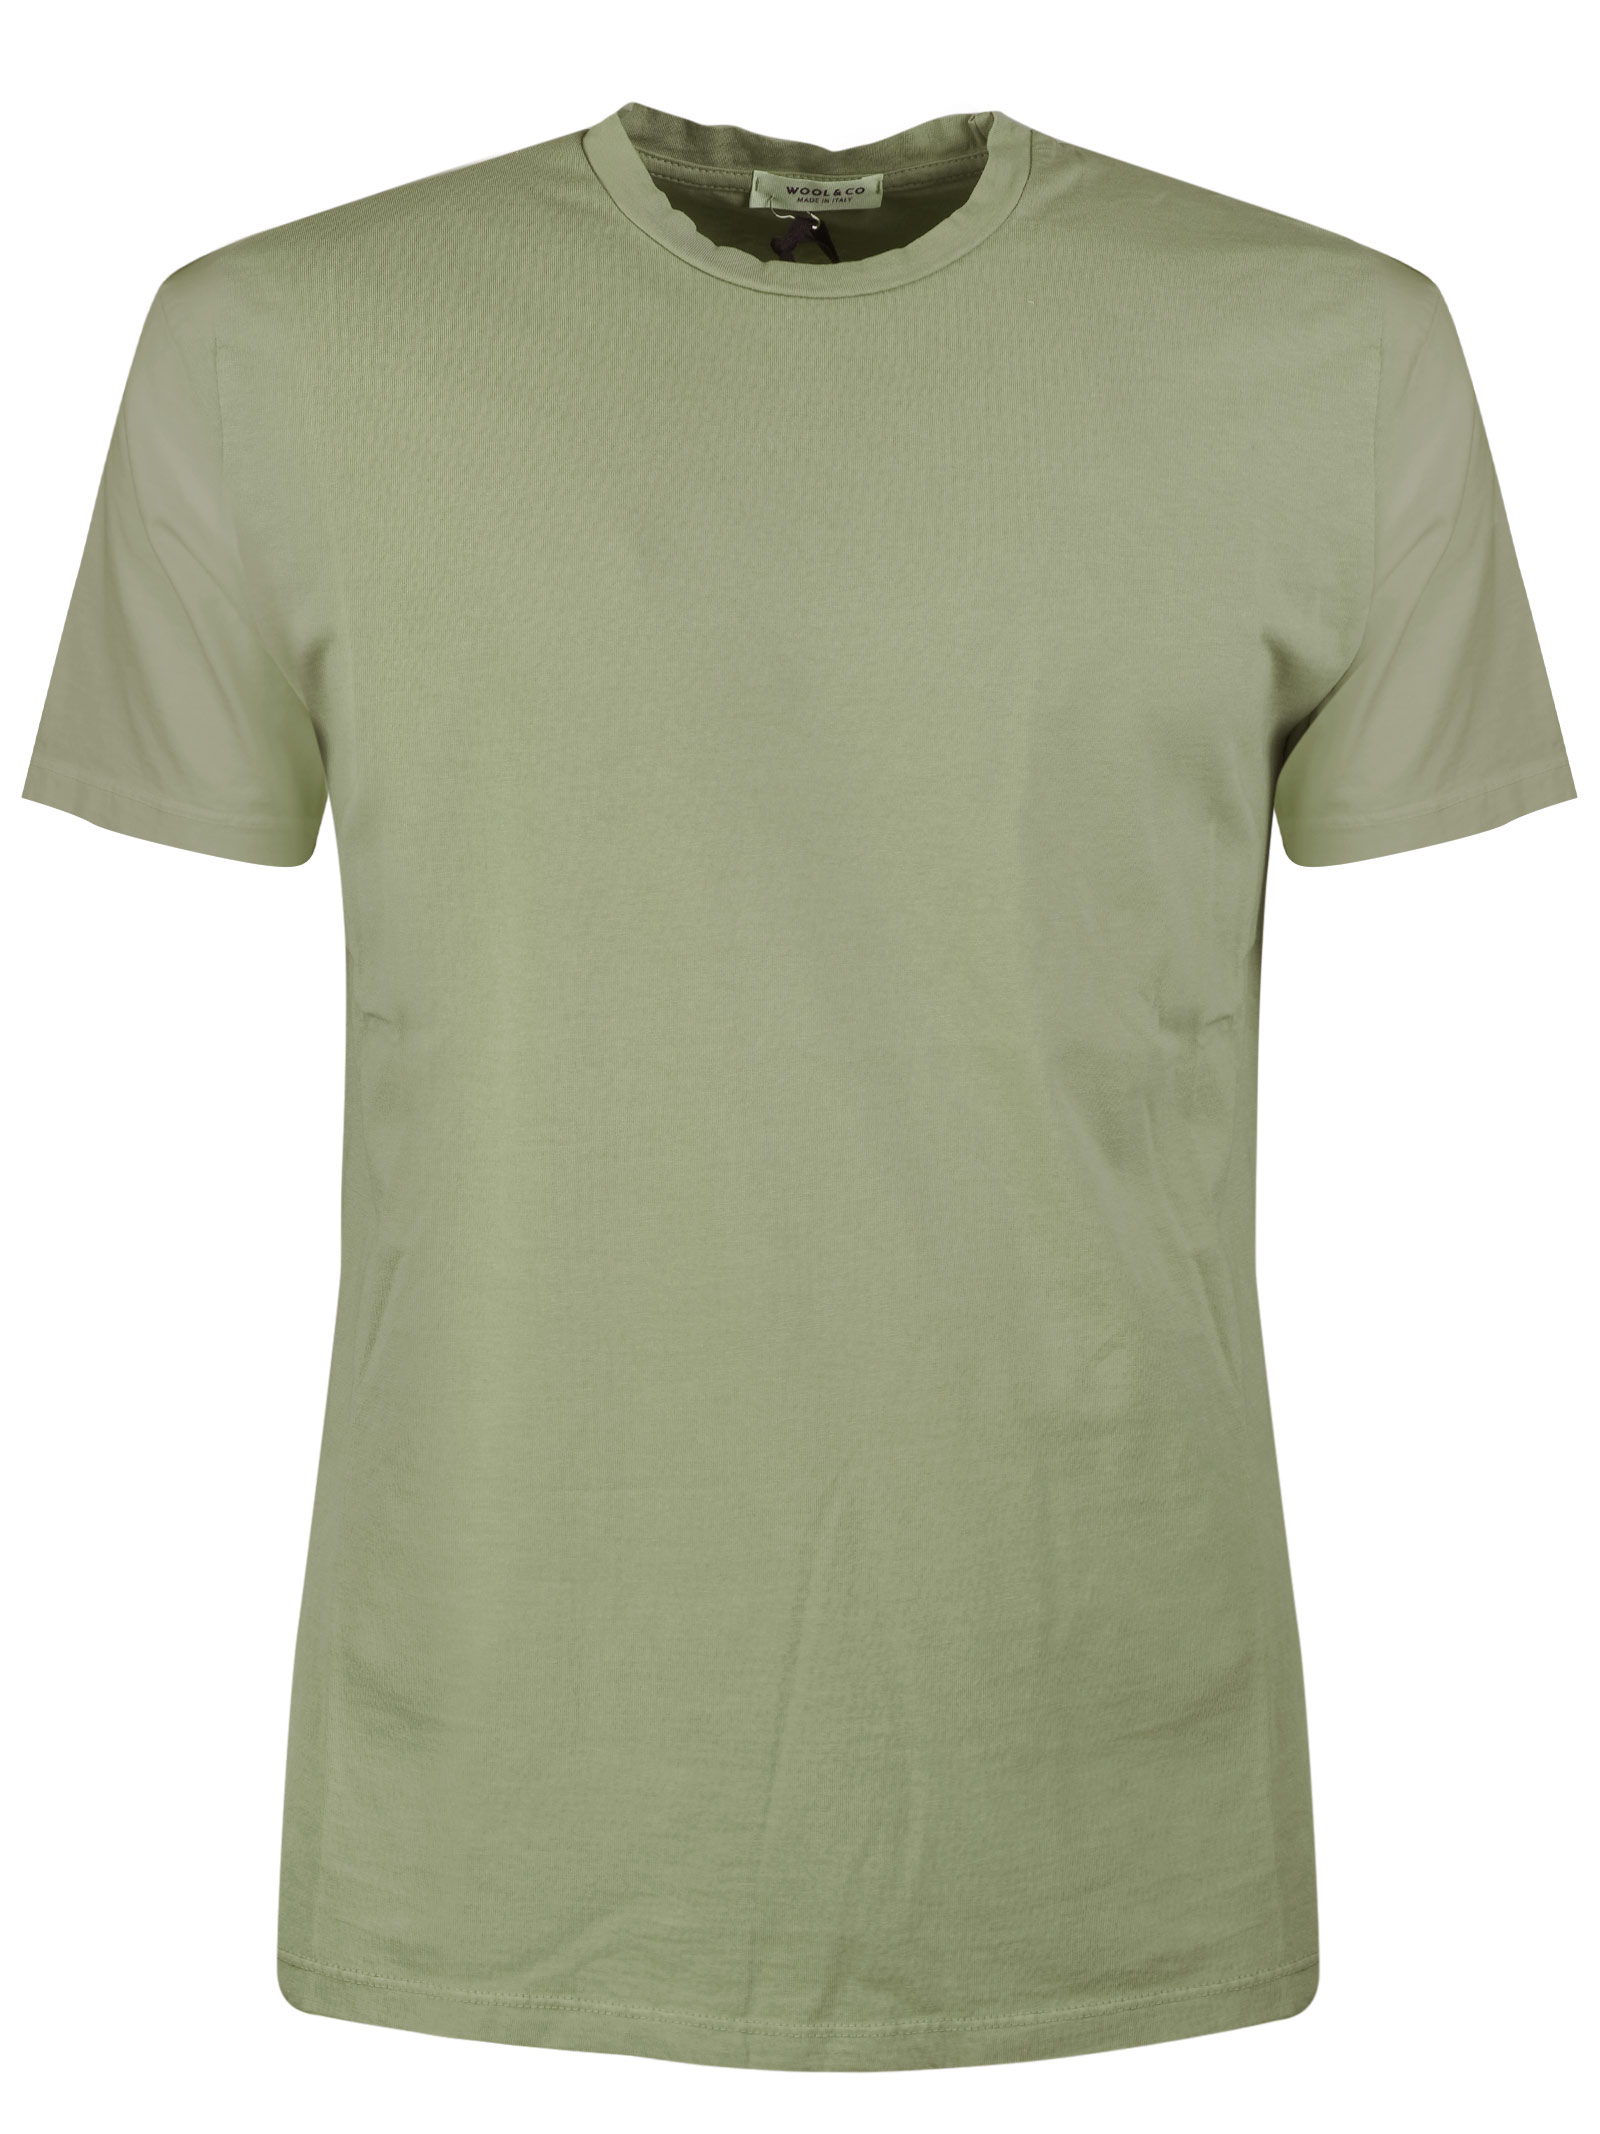 t-shirt manica corta WOOL & CO. | T- shirt | 082548